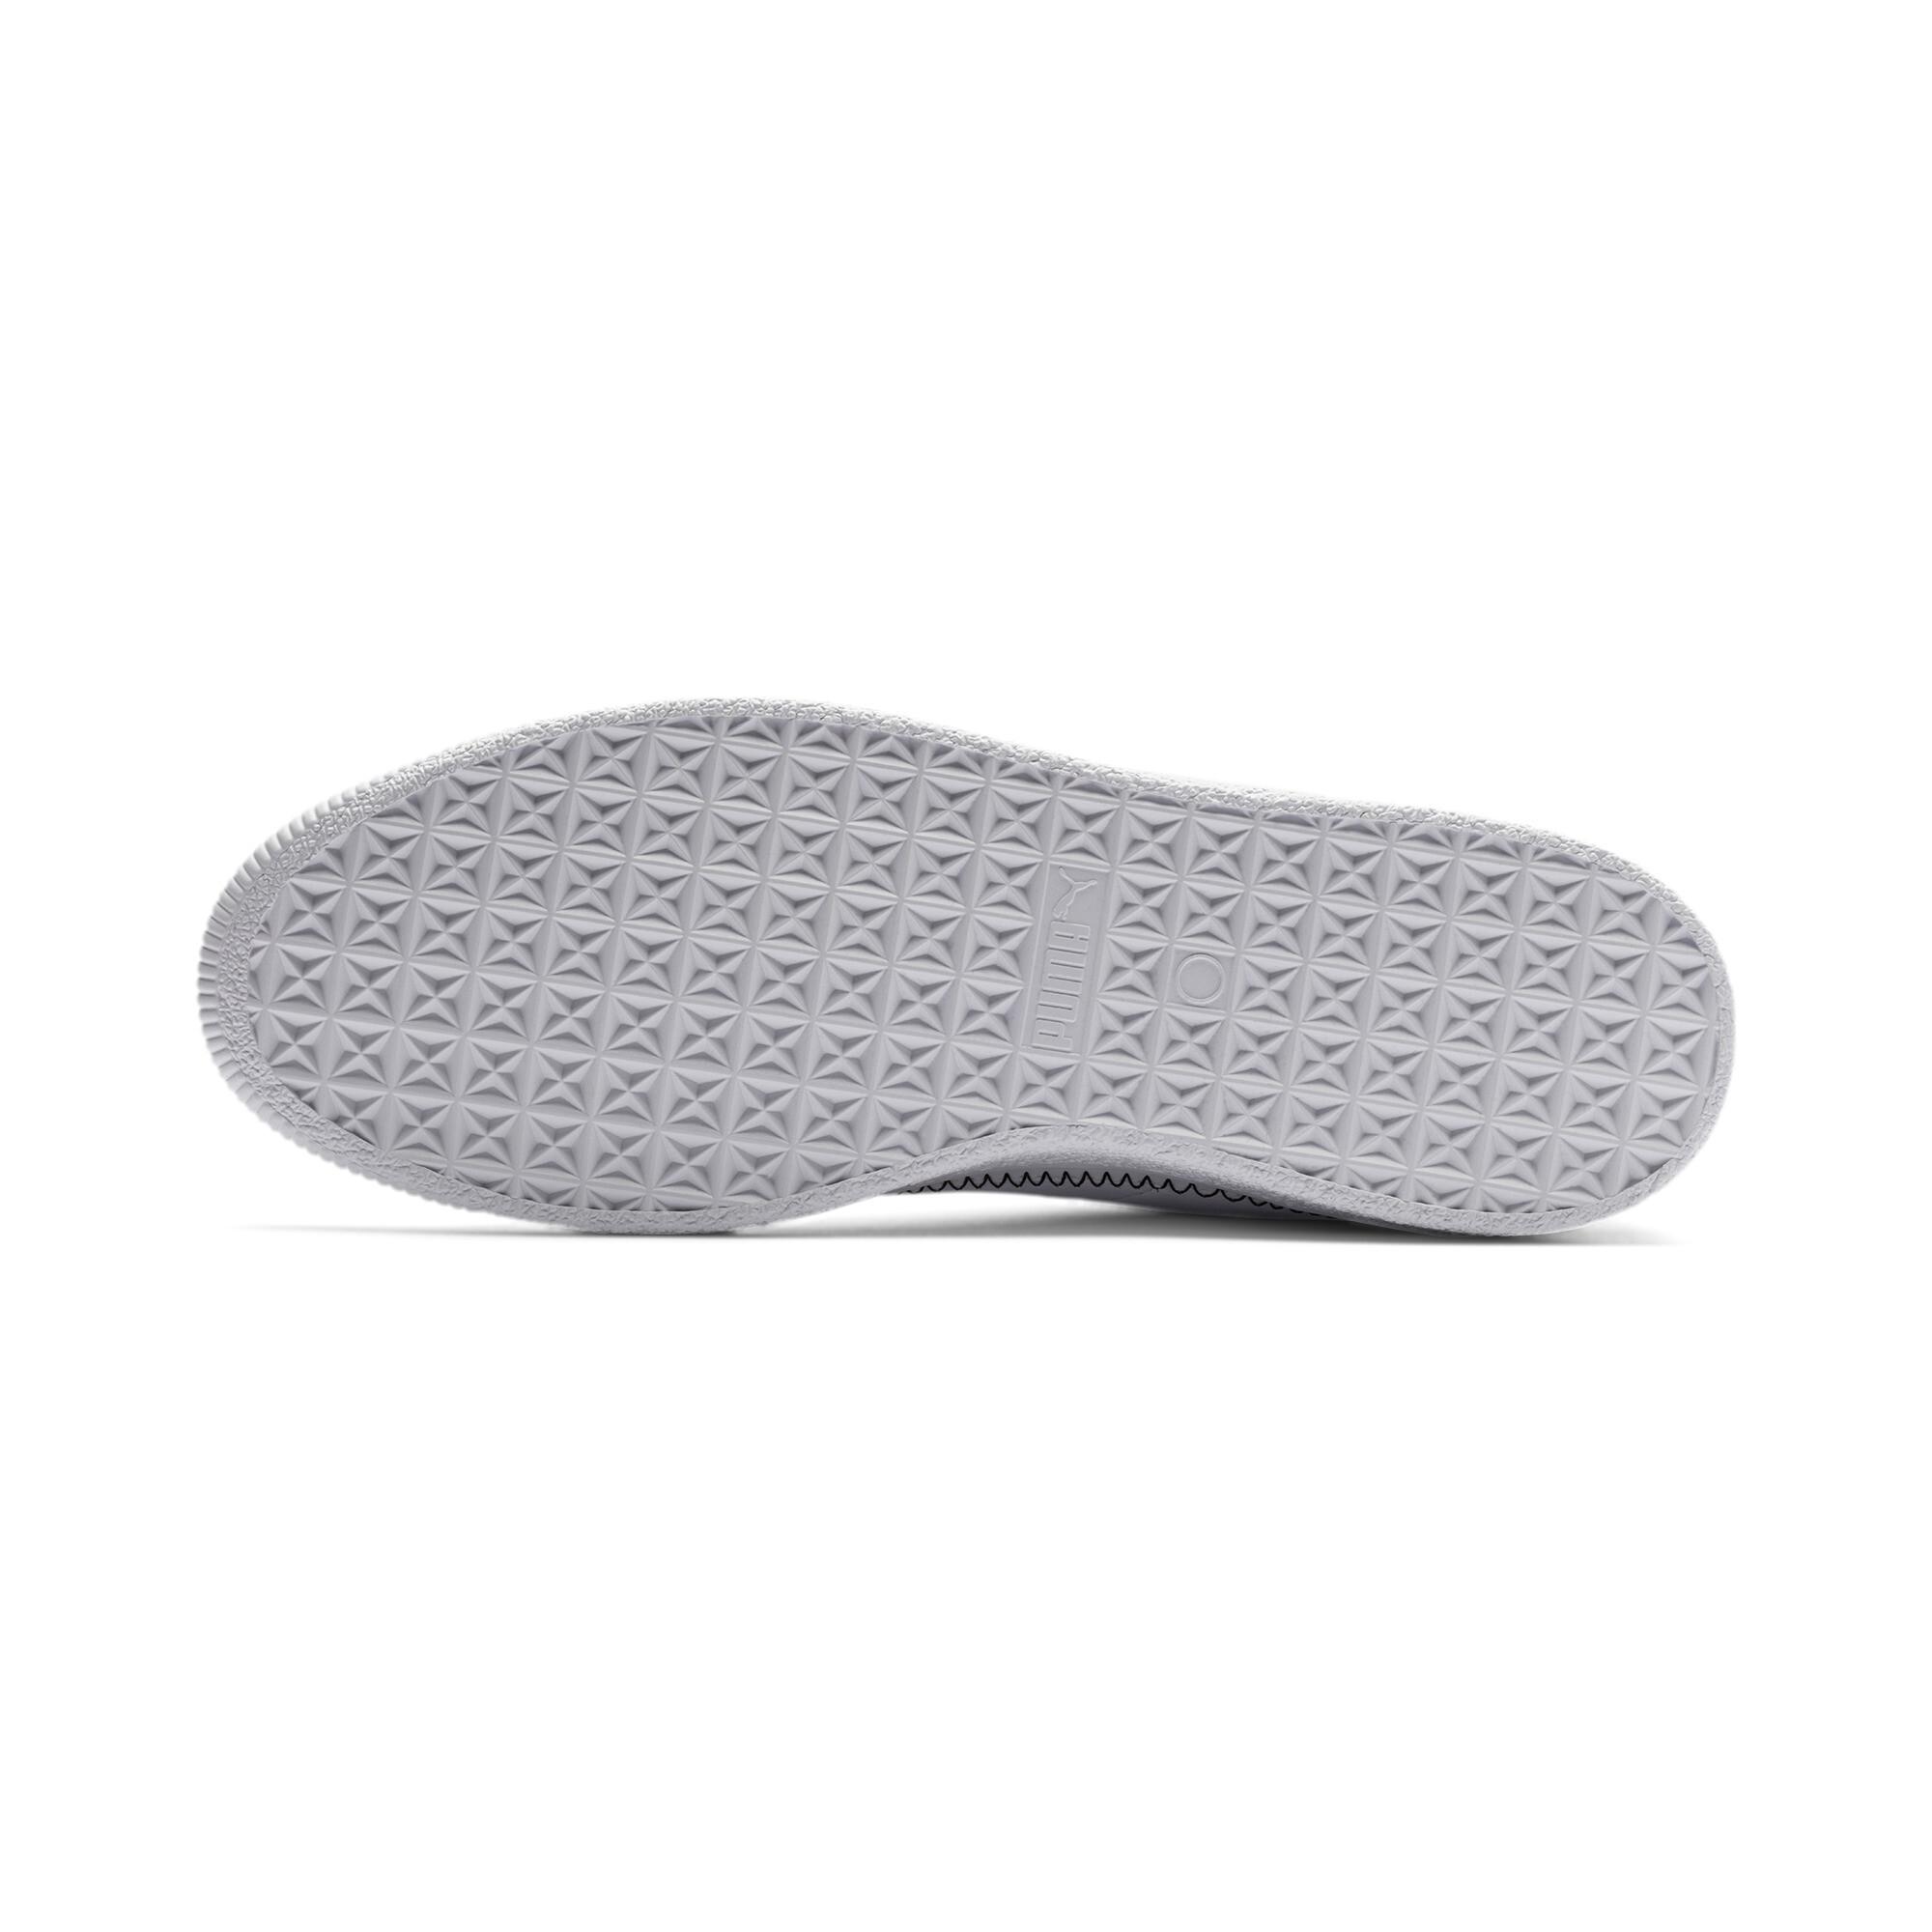 Indexbild 23 - PUMA Basket Stitch Sneaker Unisex Schuhe Neu